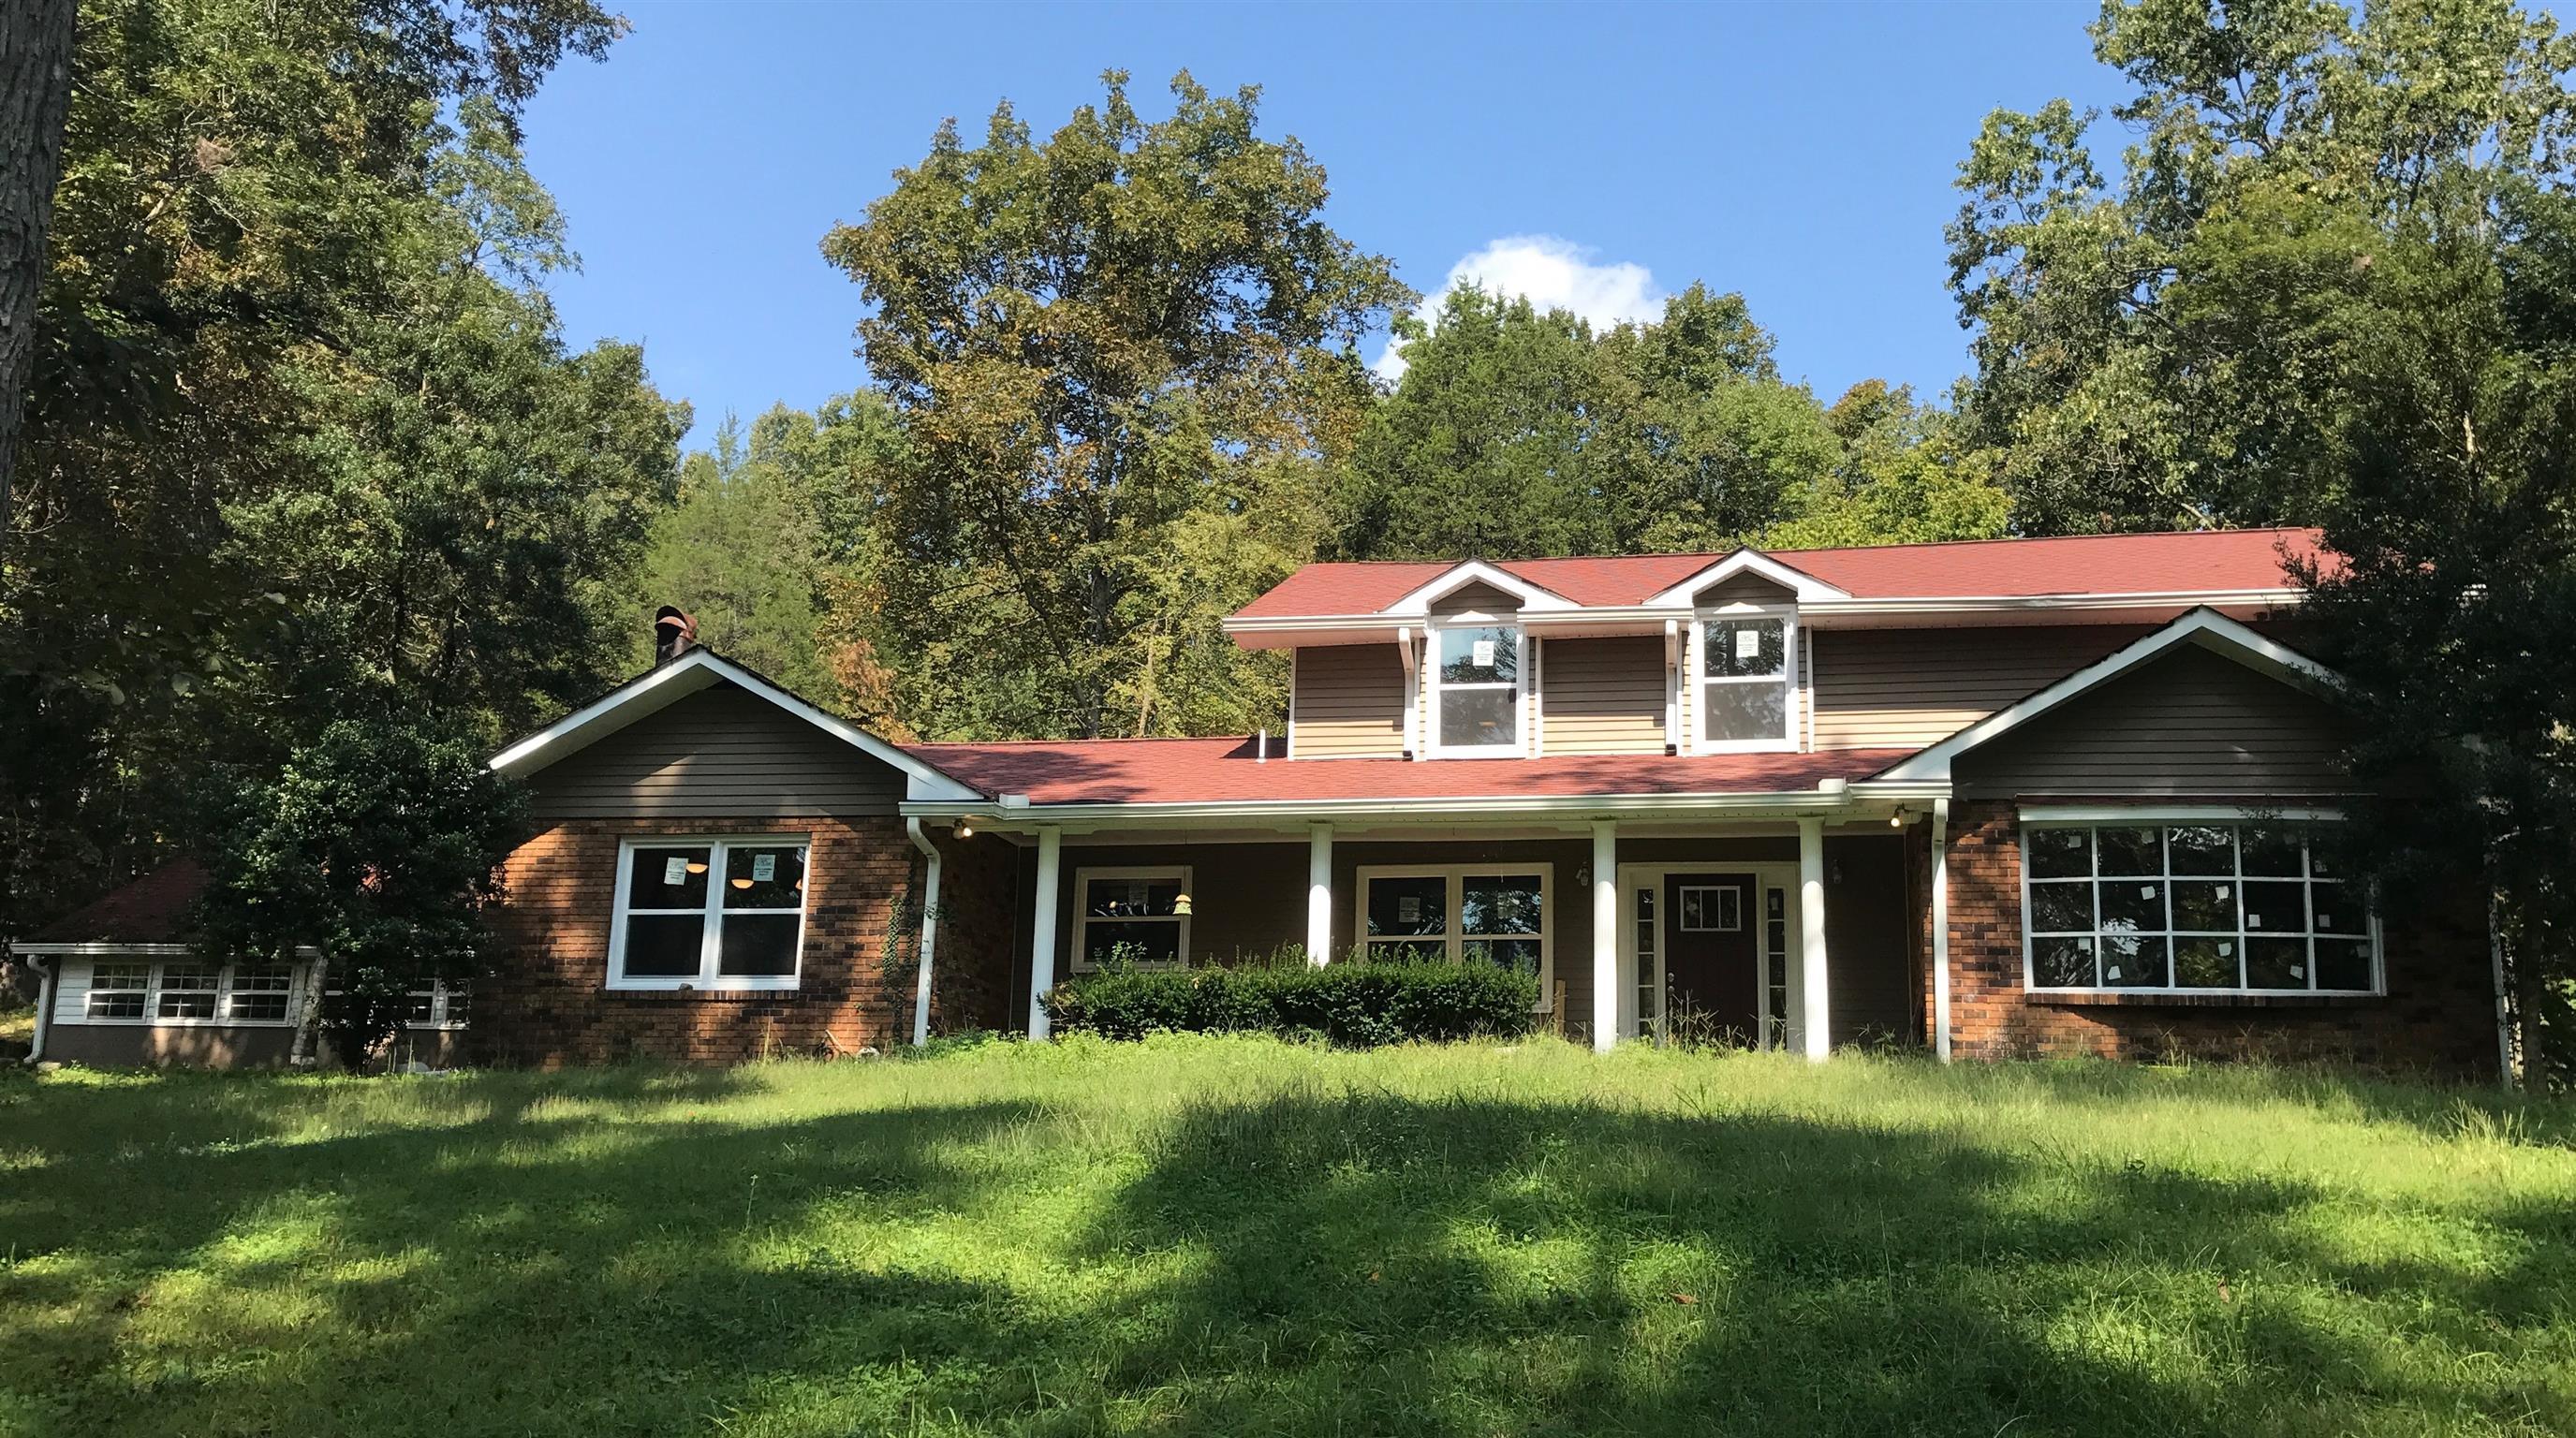 10819 Highway 13 N, Erin, TN 37061 - Erin, TN real estate listing